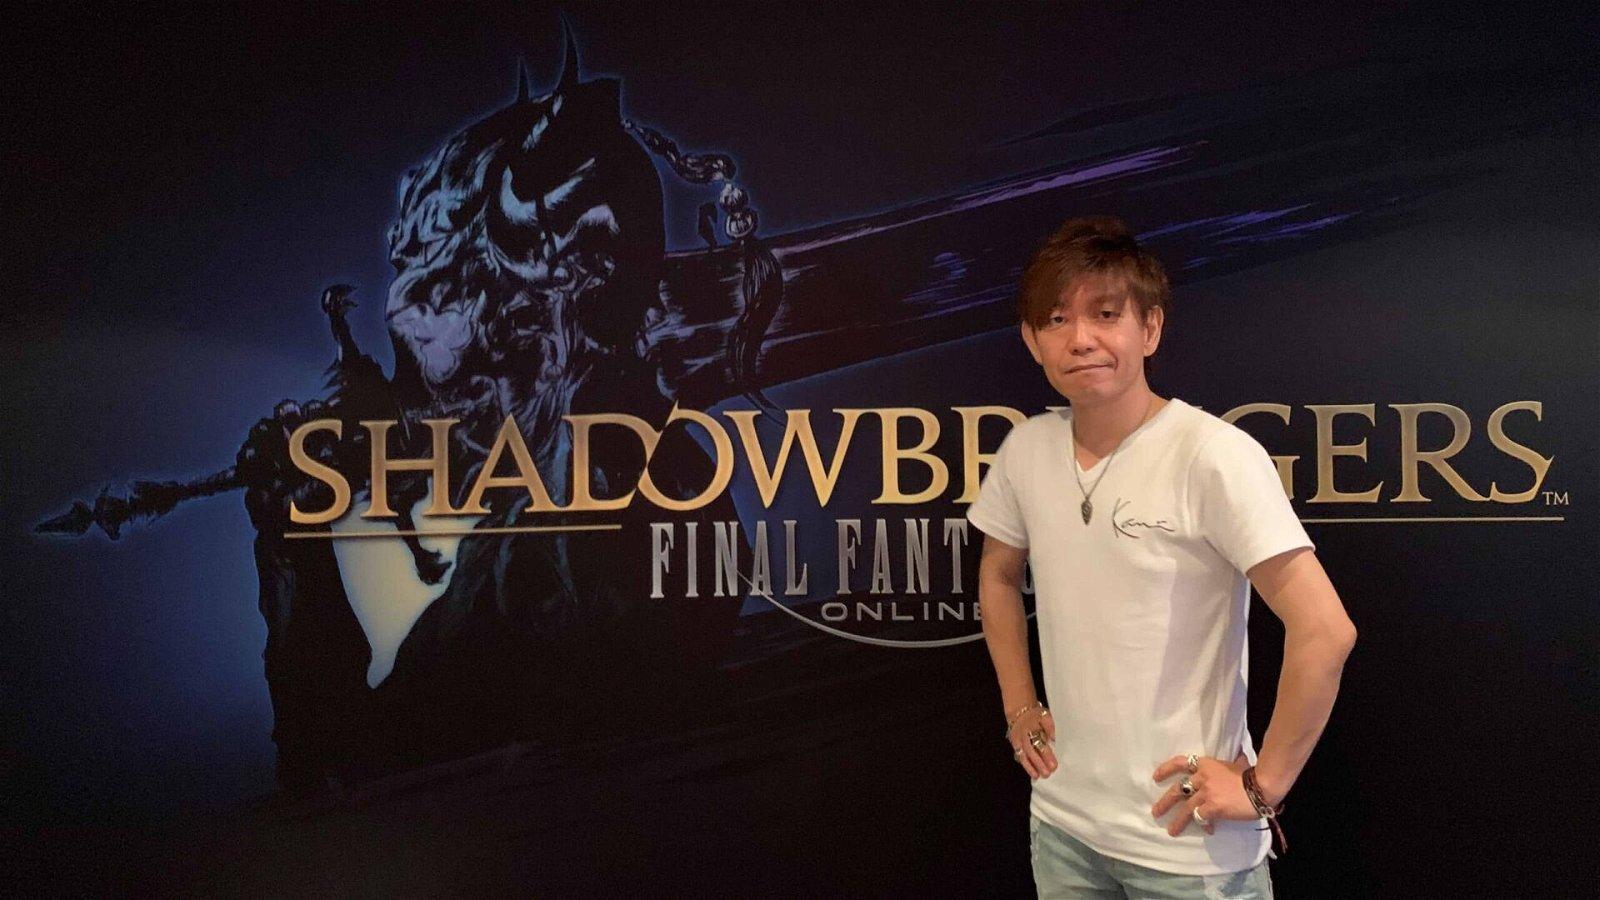 Final Fantasy XIV: Shadowbringers E3 2019 Interview with Naoki Yoshida 3